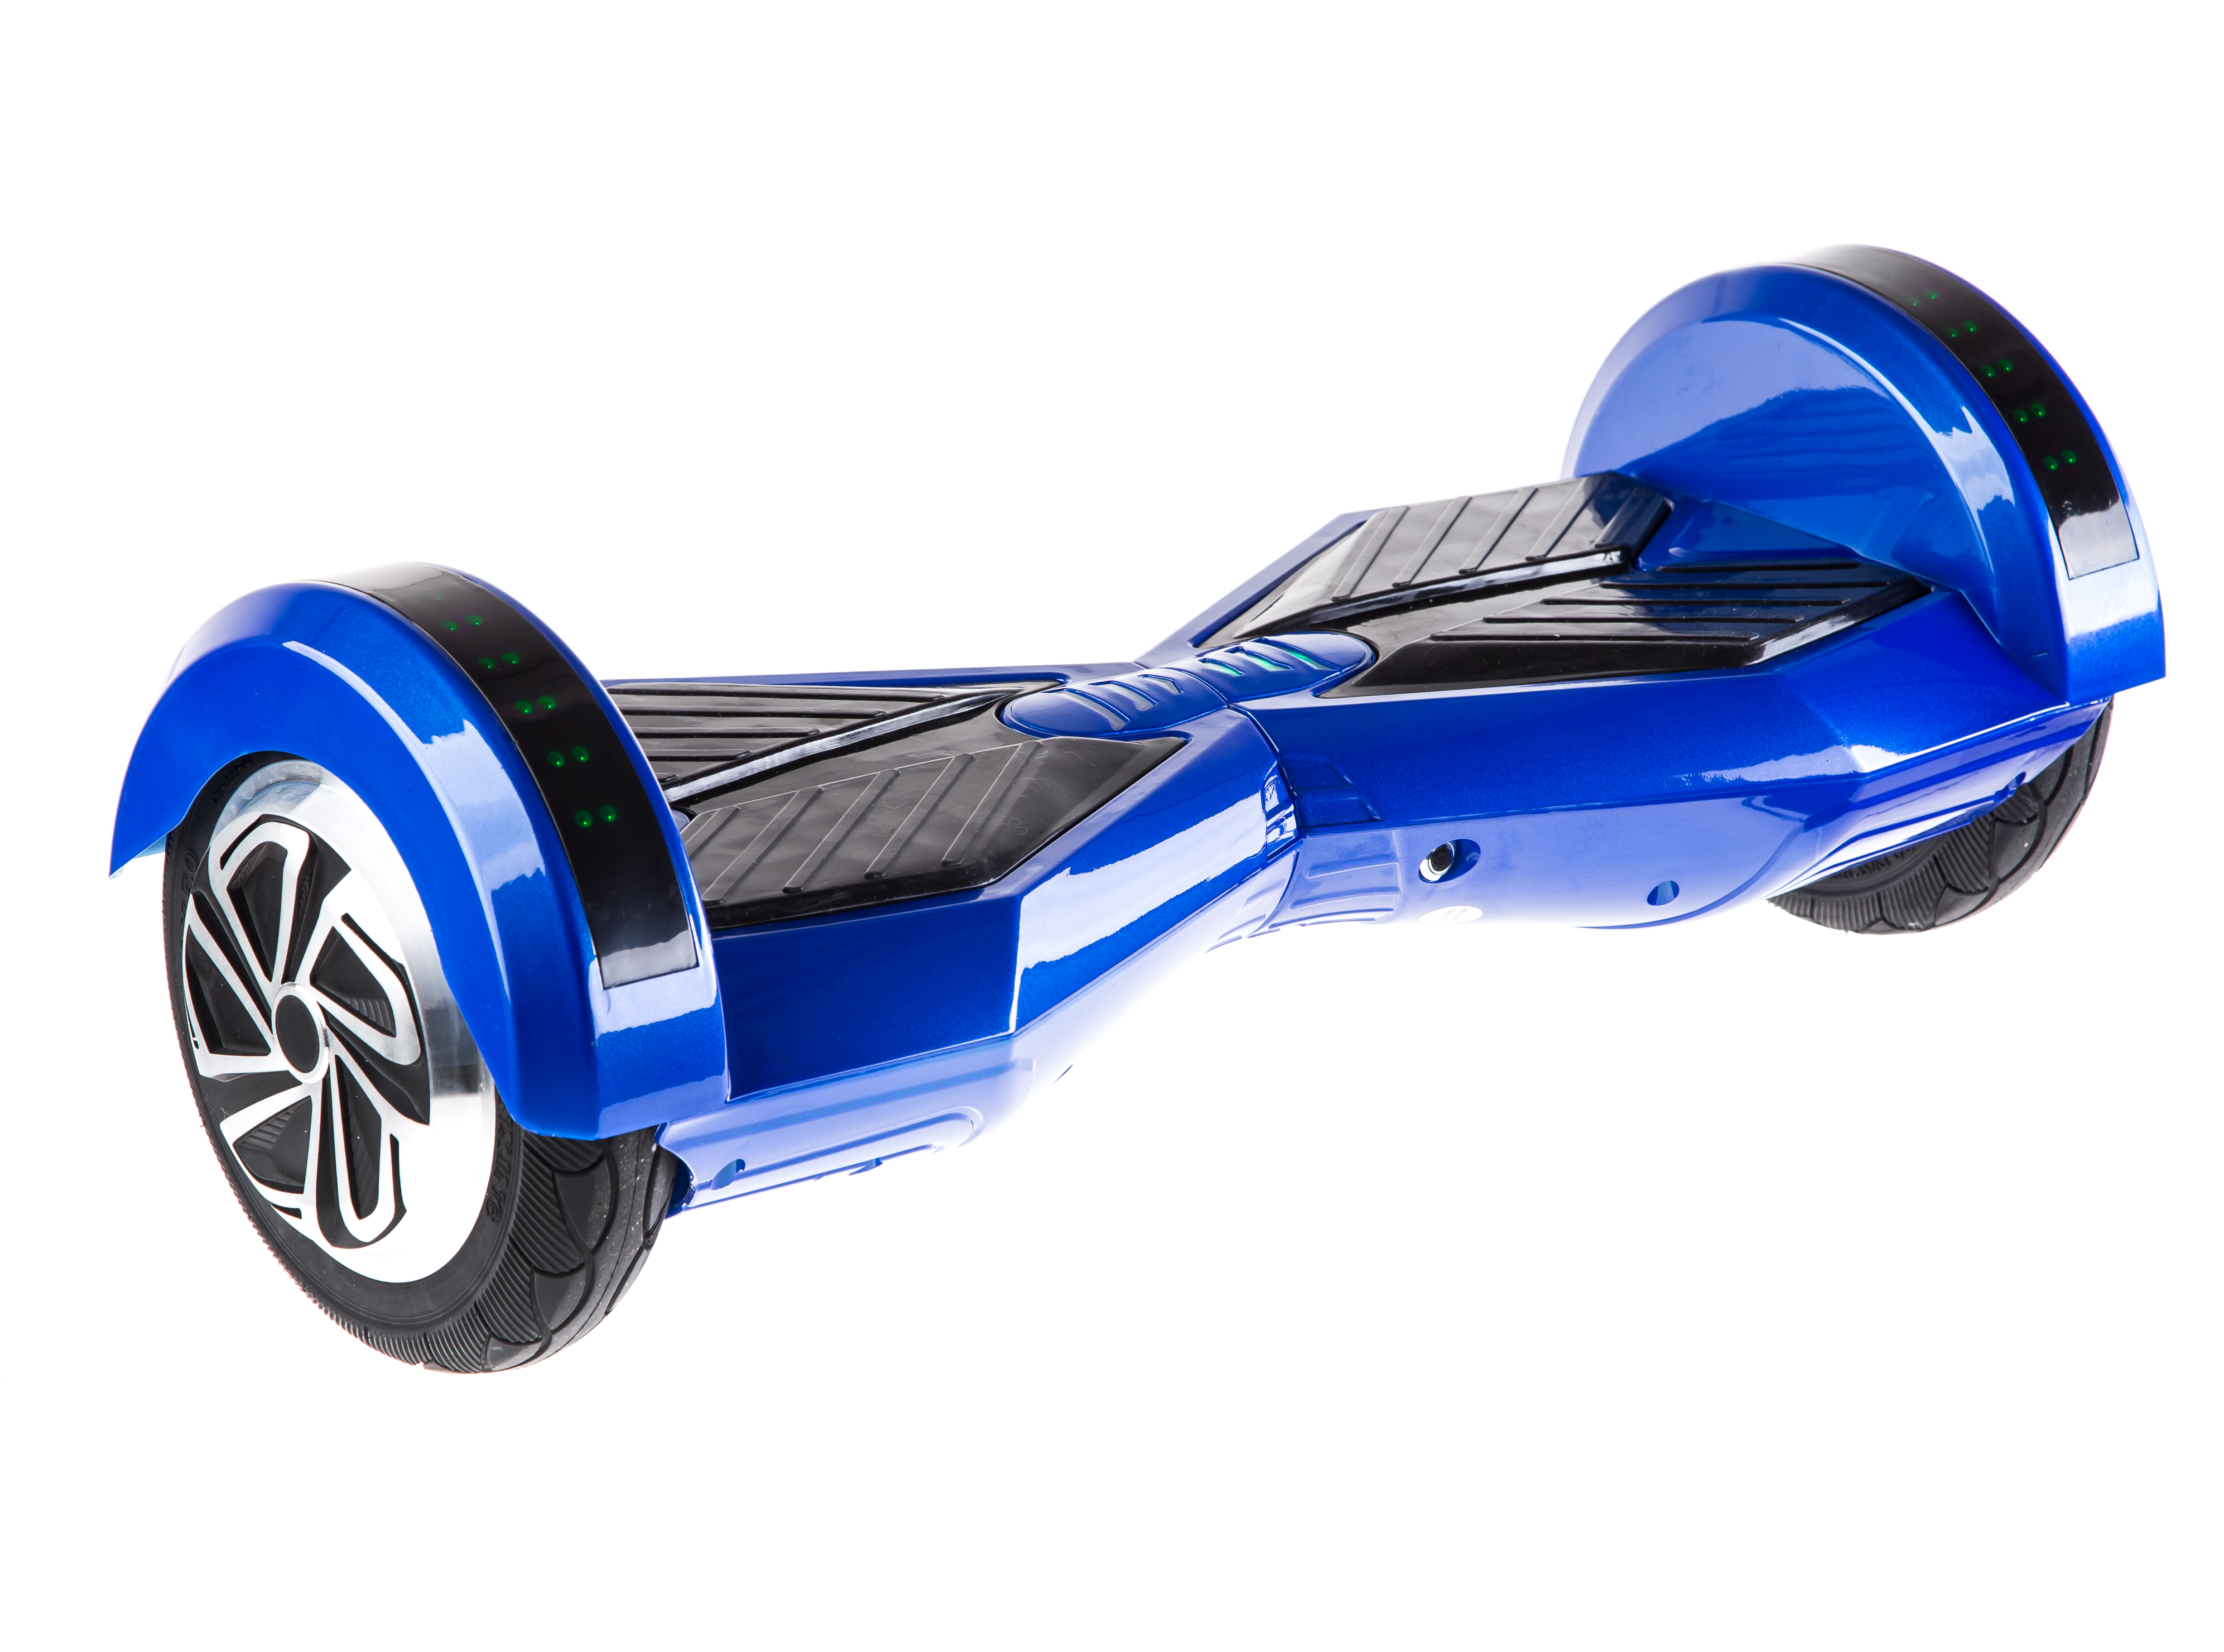 Гироскутер Superbsail Esu-013/8 синий